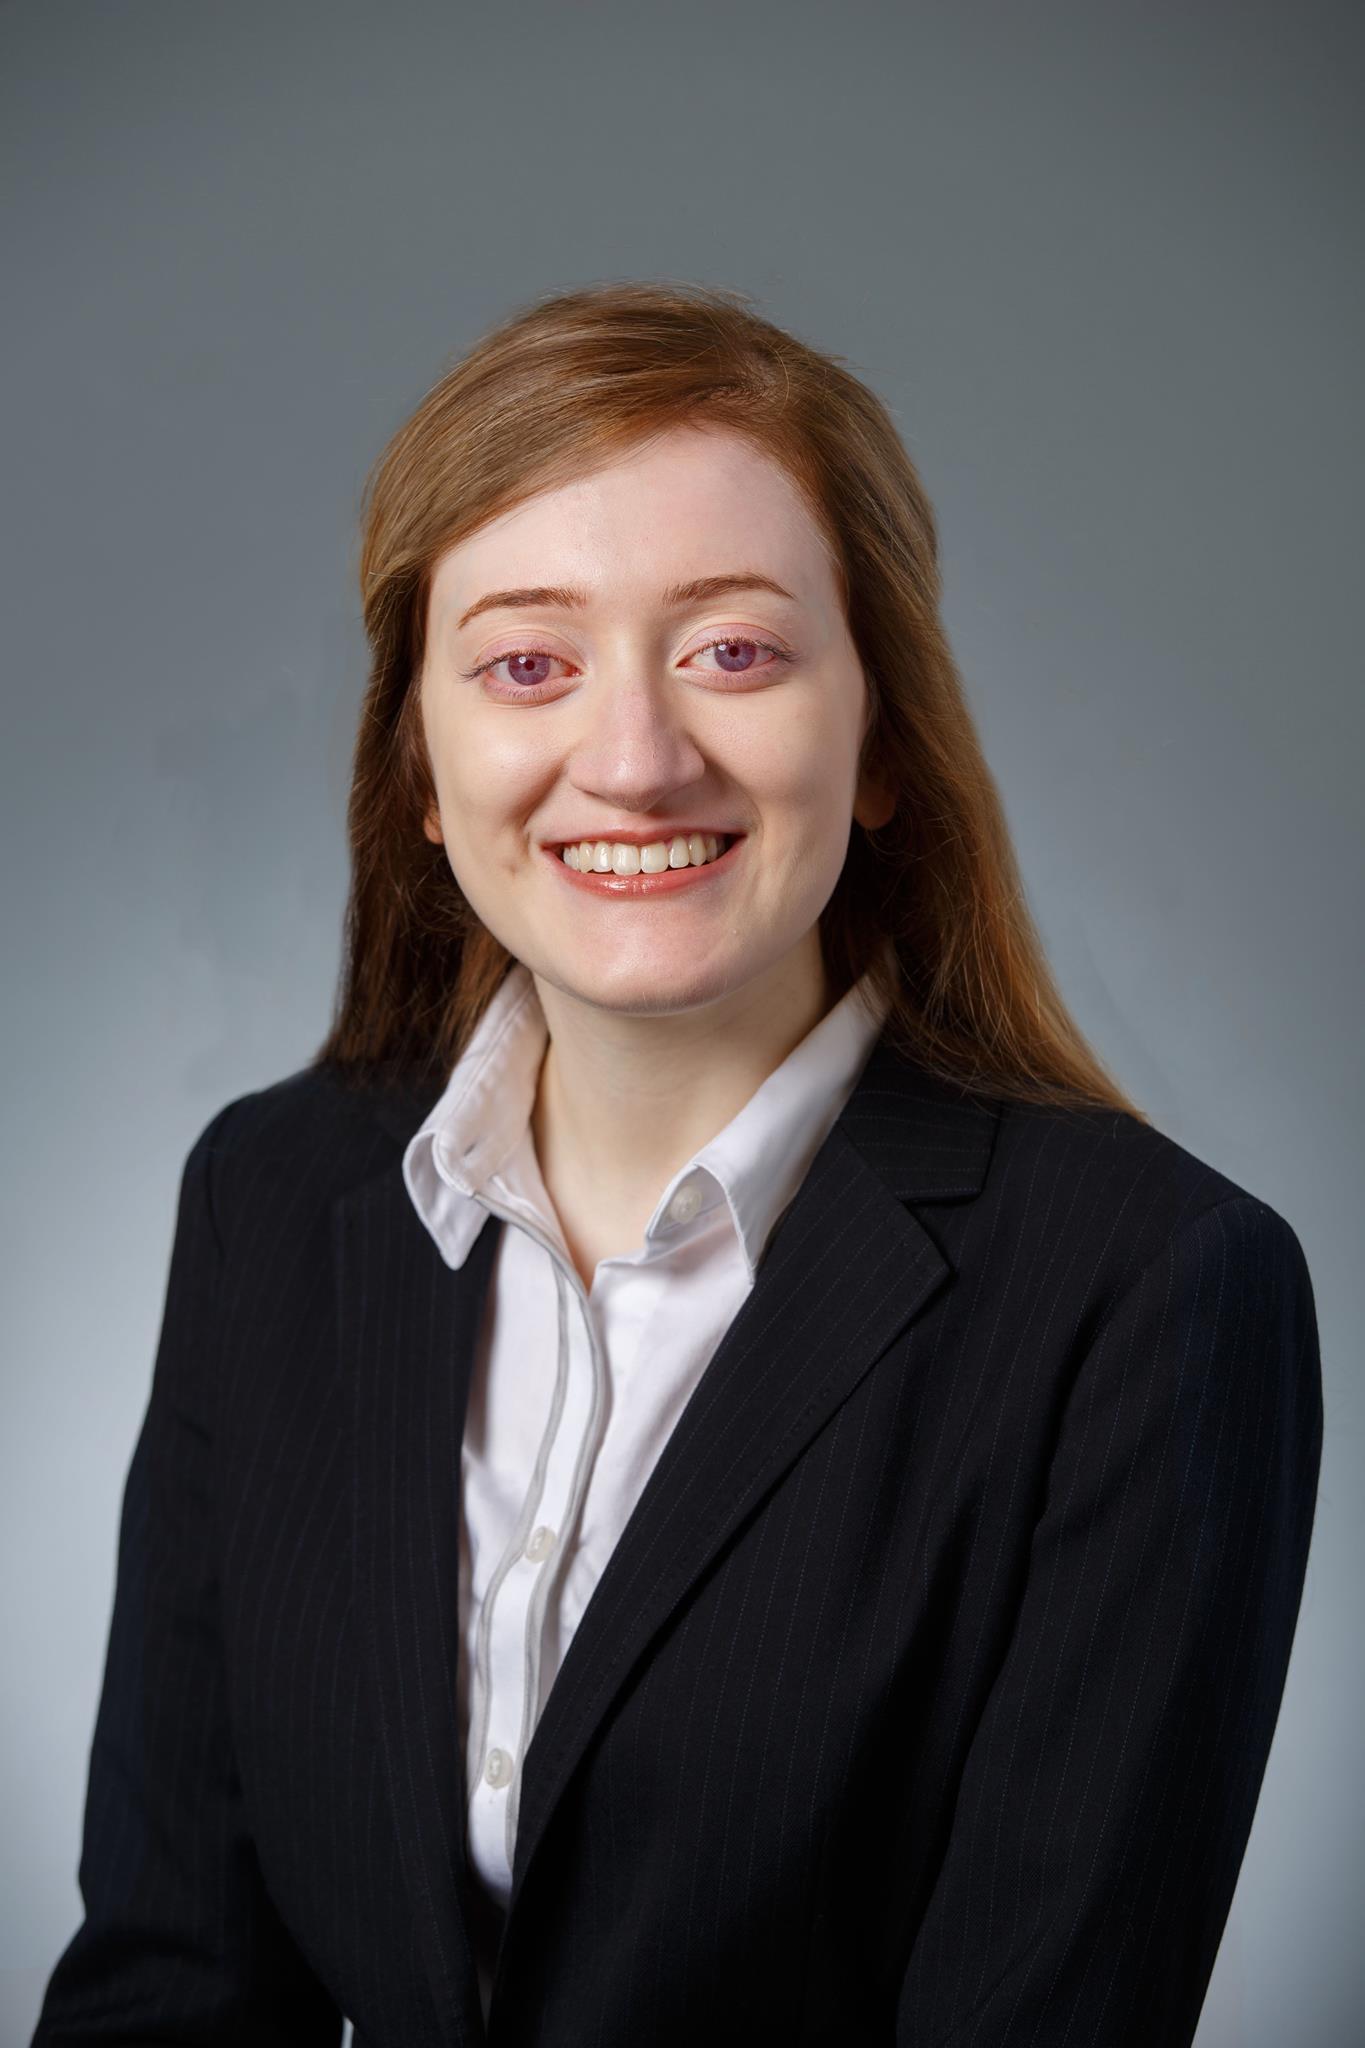 Sarina Dass